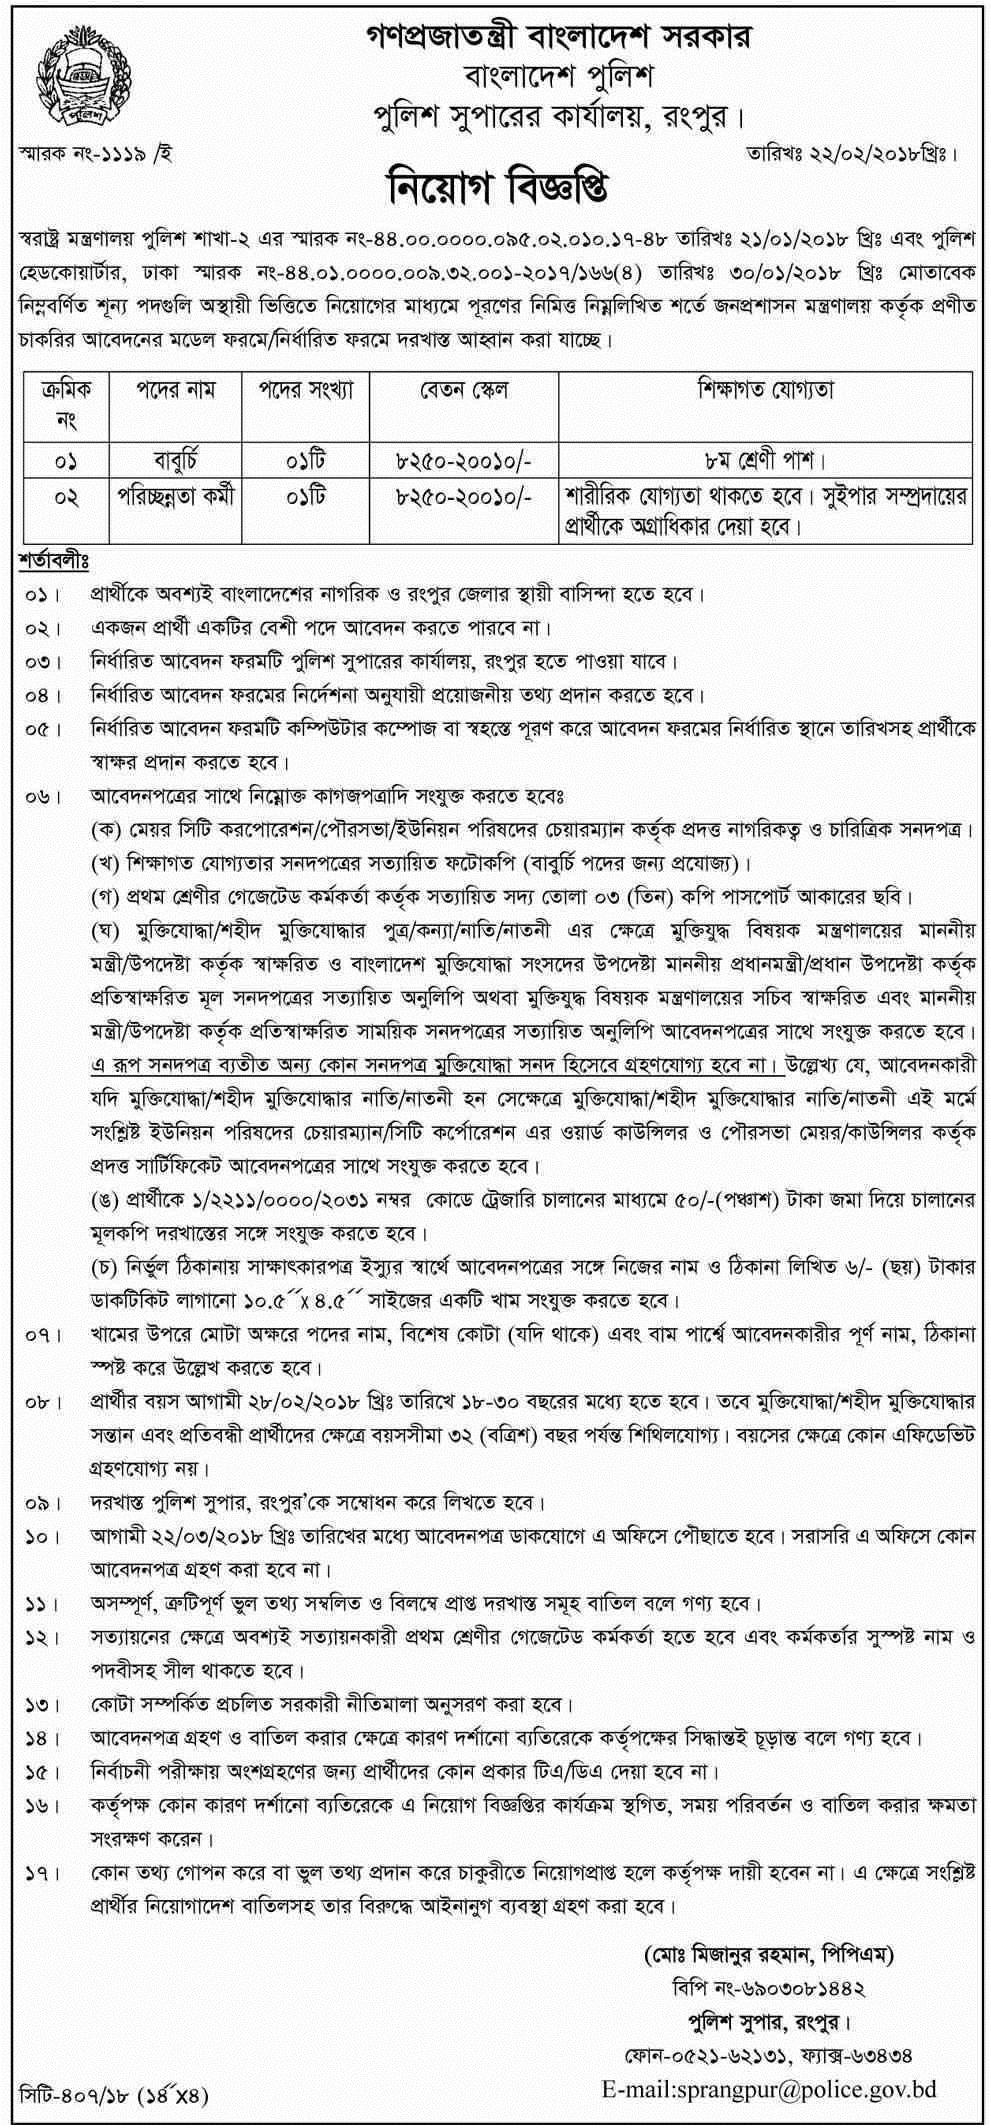 cover letter for emploment agreement biodata format powerpoint